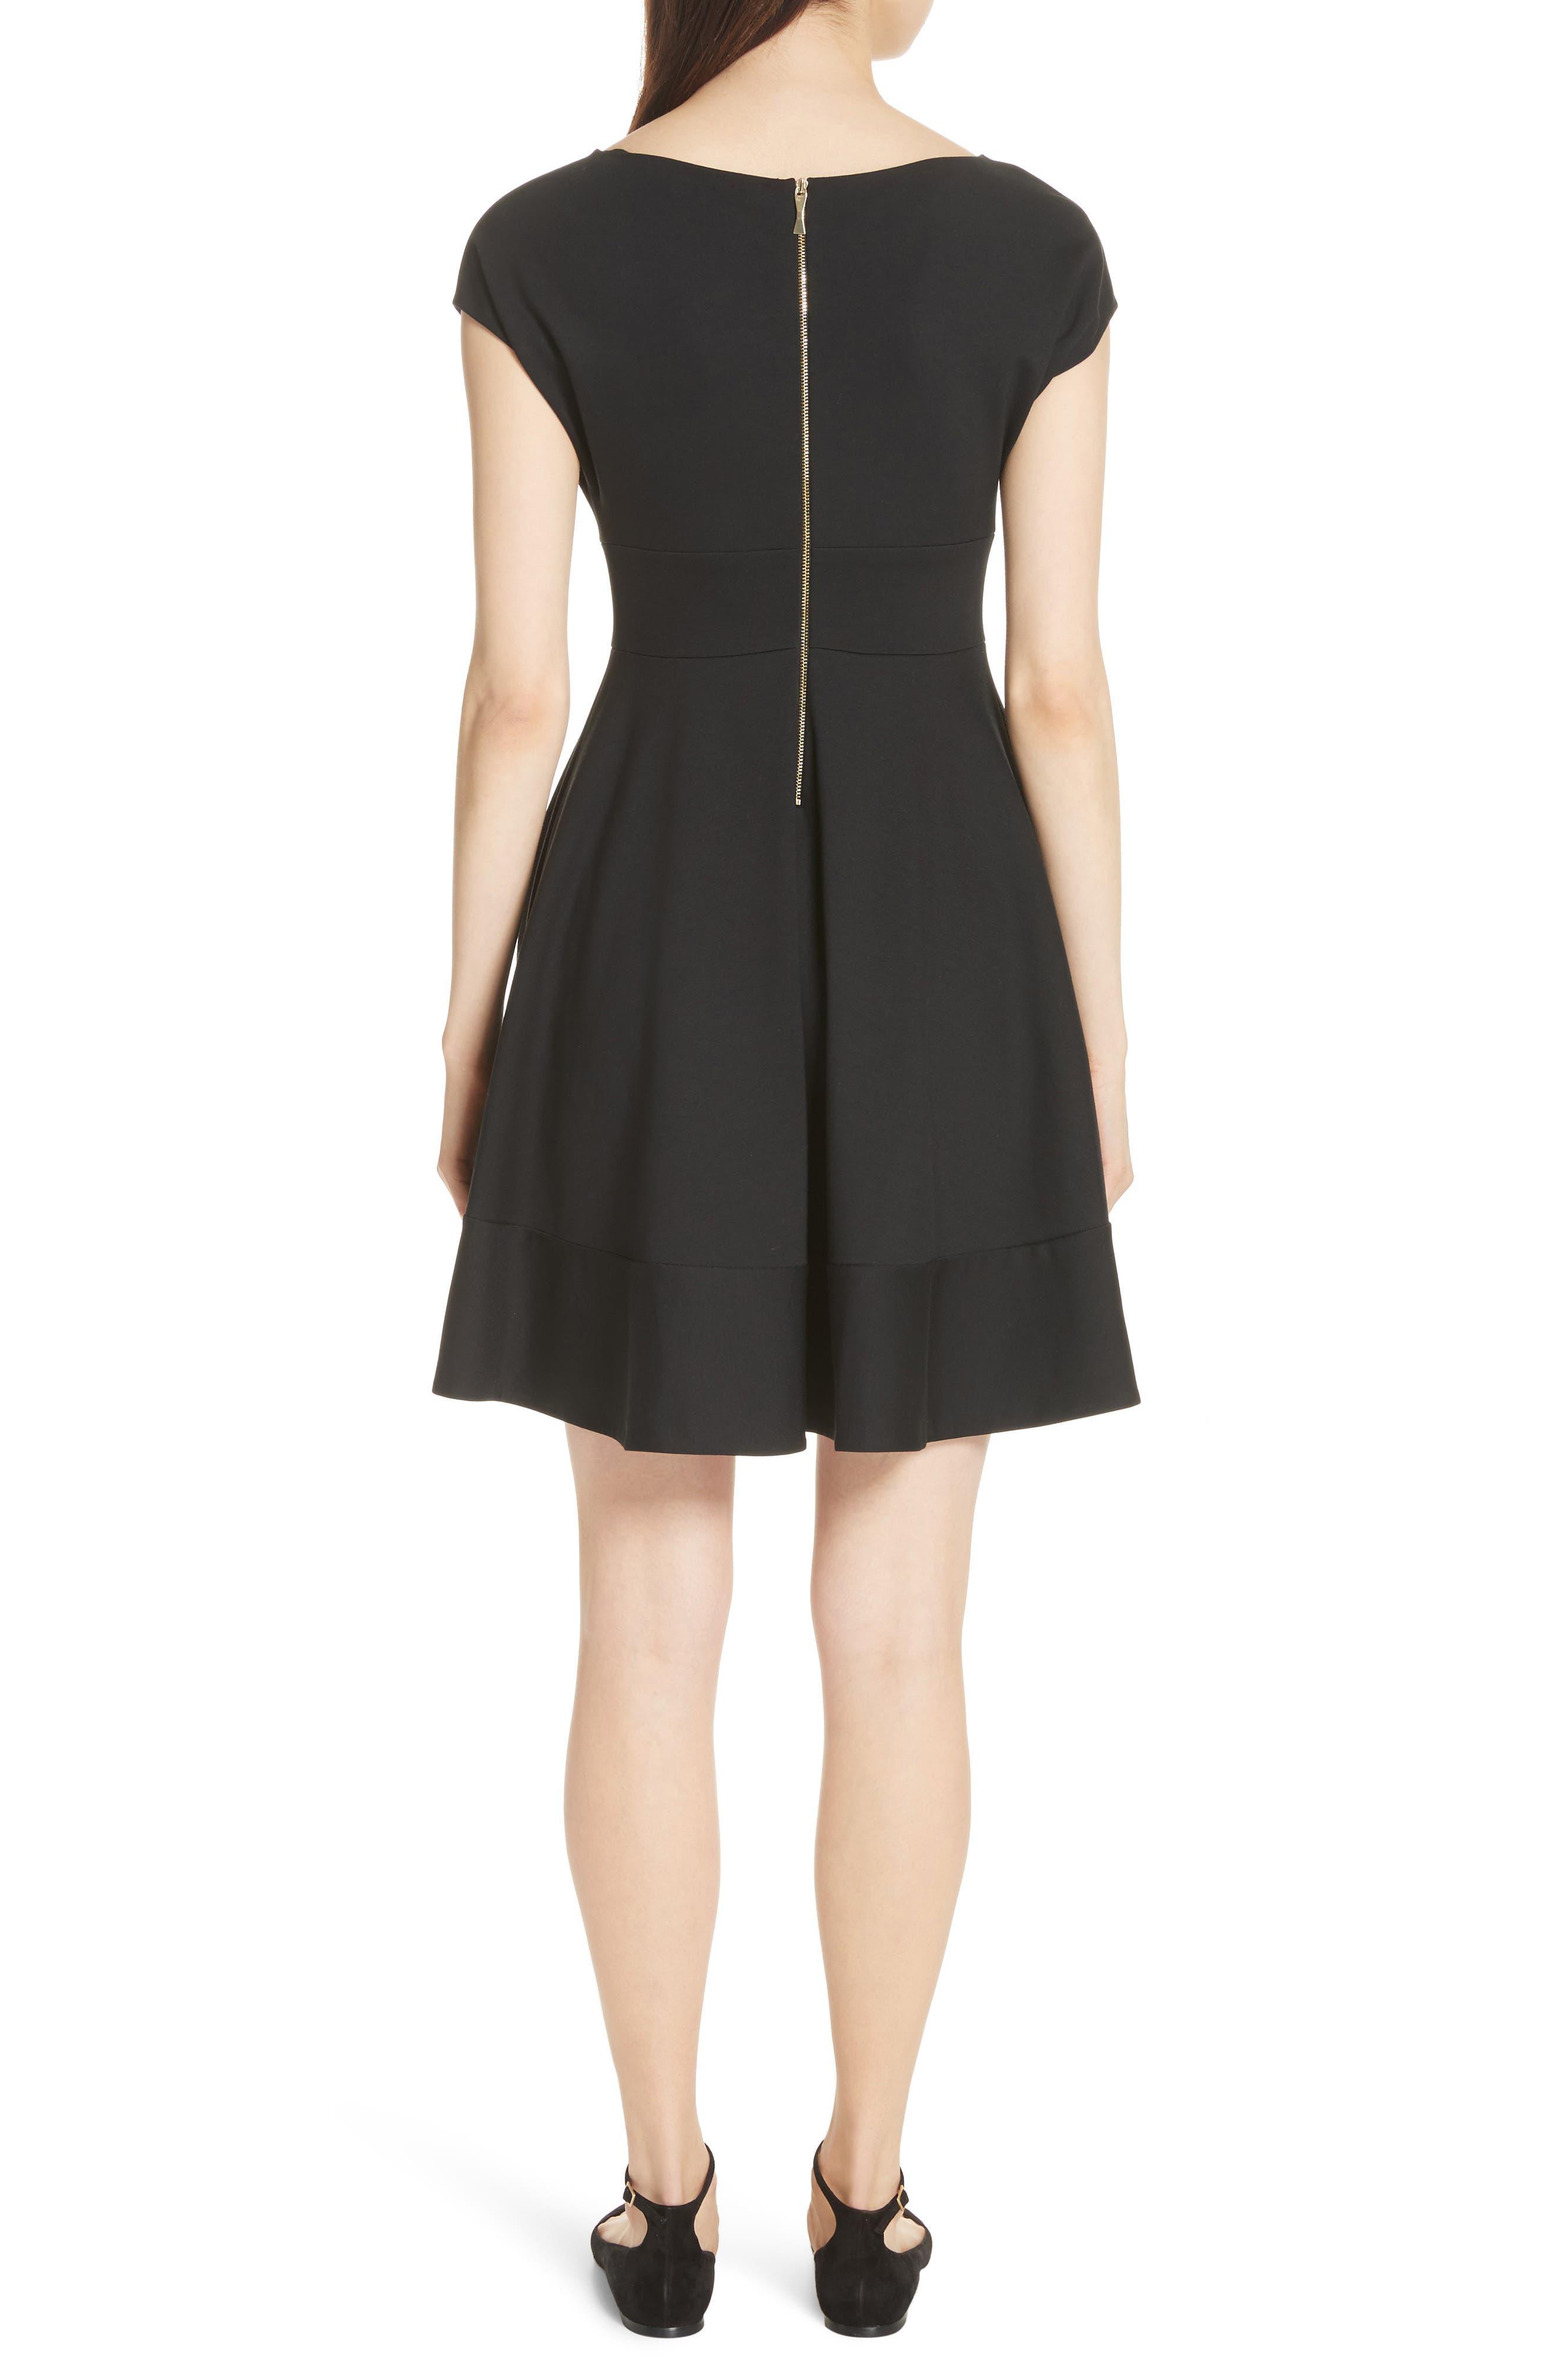 KATE SPADE NEW YORK,                             ponte fiorella fit & flare dress,                             Alternate thumbnail 2, color,                             BLACK